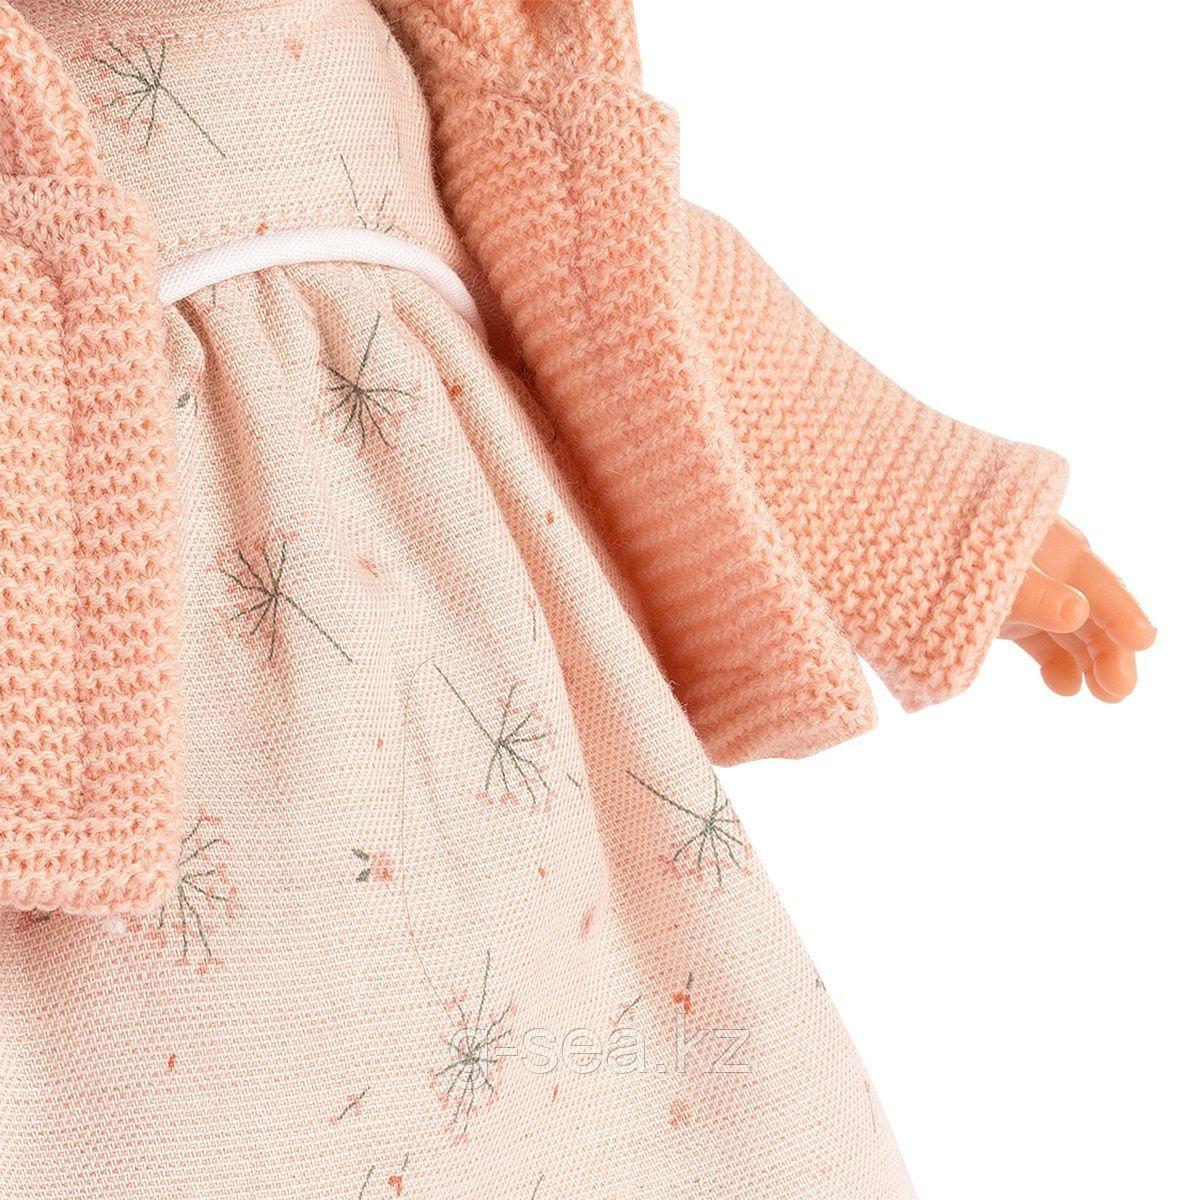 LLORENS: Кукла Рита 33 см., брюнетка в розовом жакете - фото 3